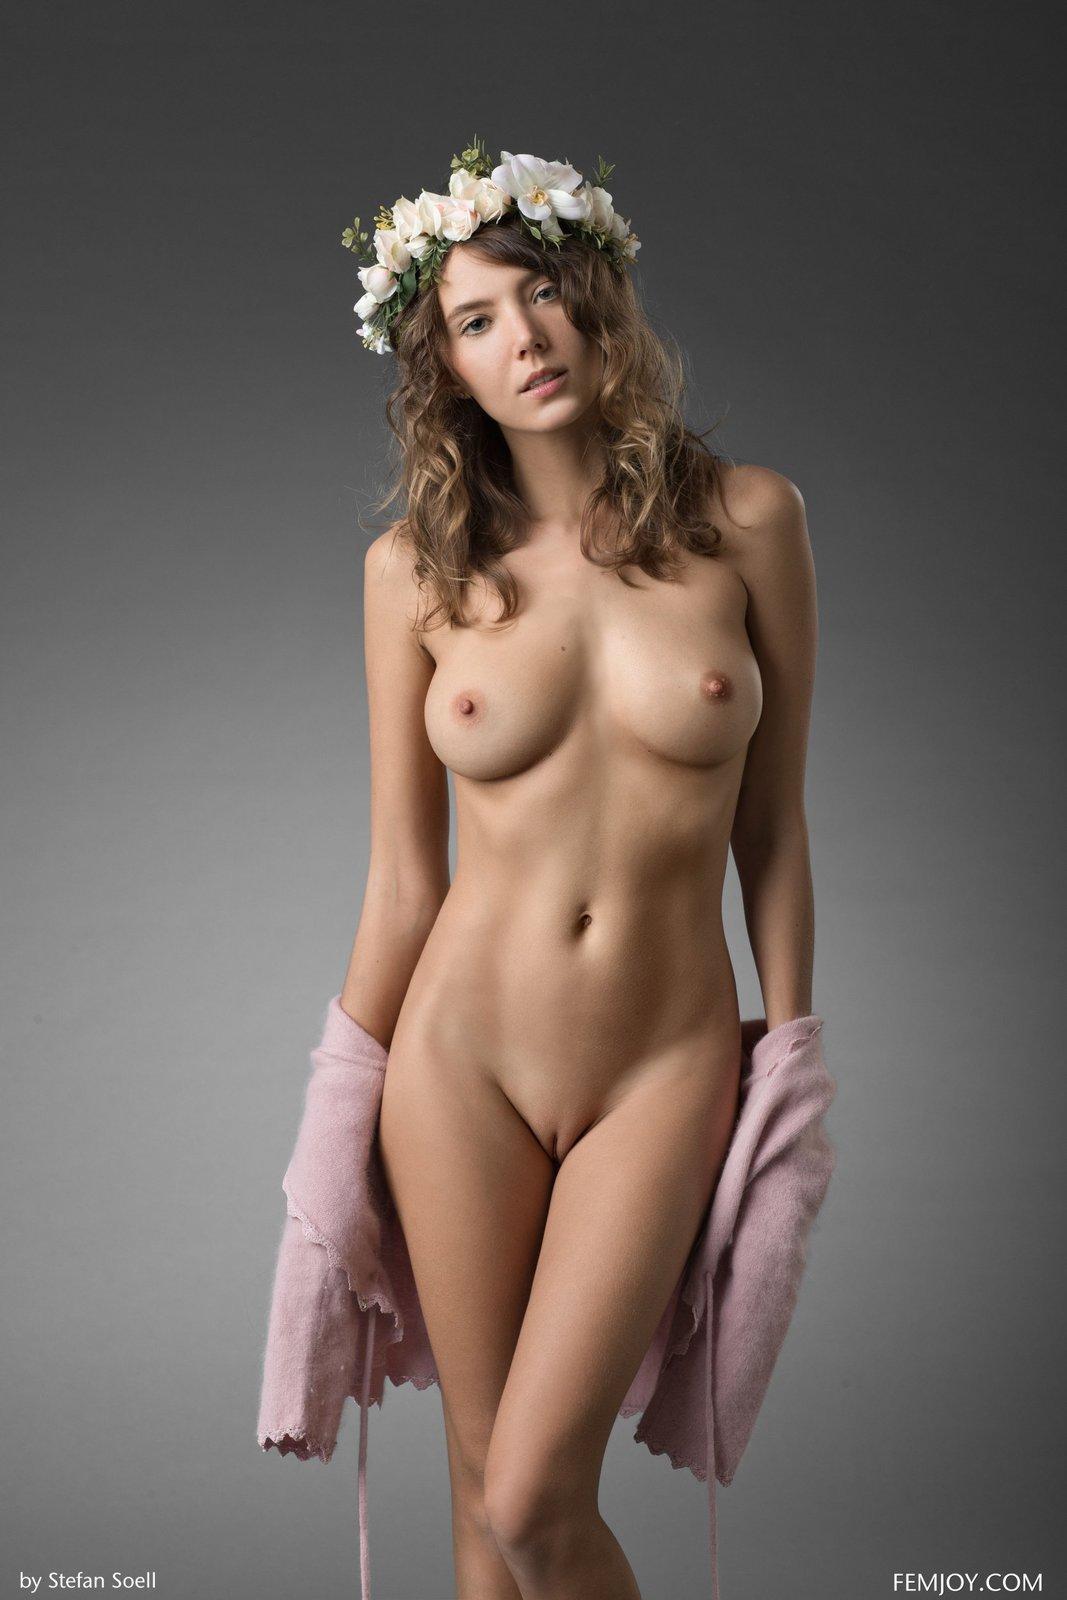 Pretty Girls Posing Nude